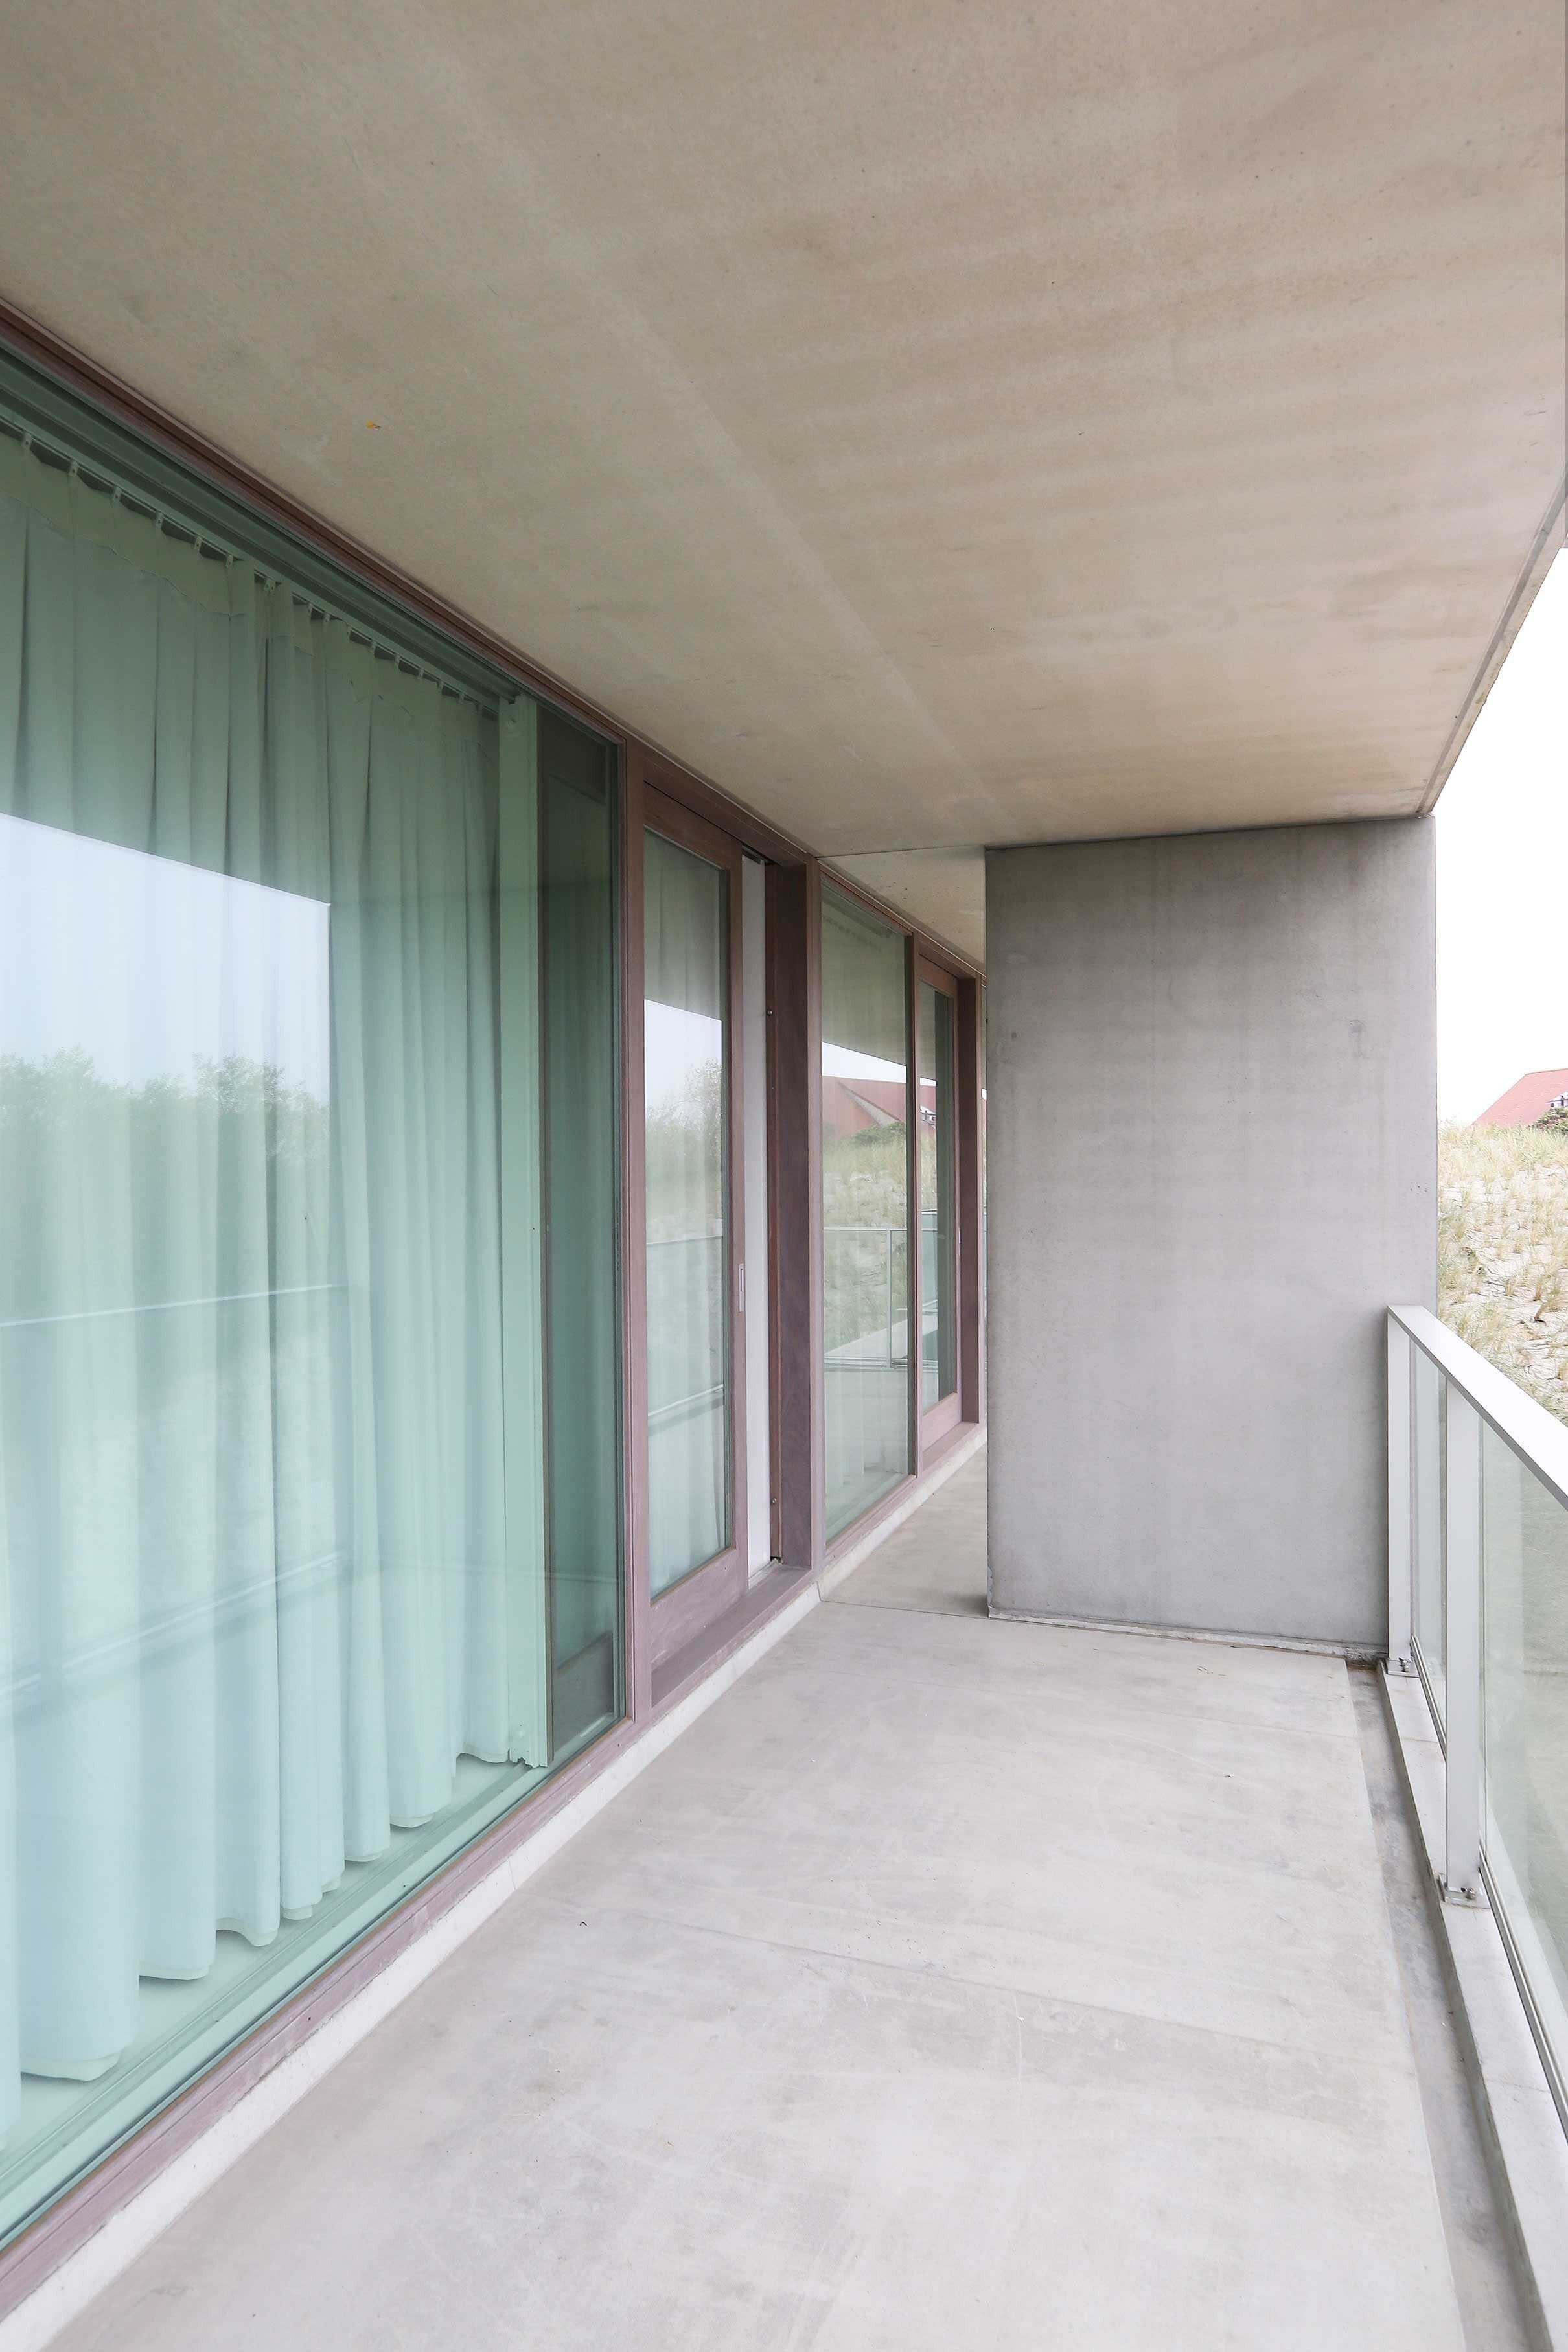 Rietveldprojects.be-ArneJ-duinen-design-architectuur-kust12.jpg